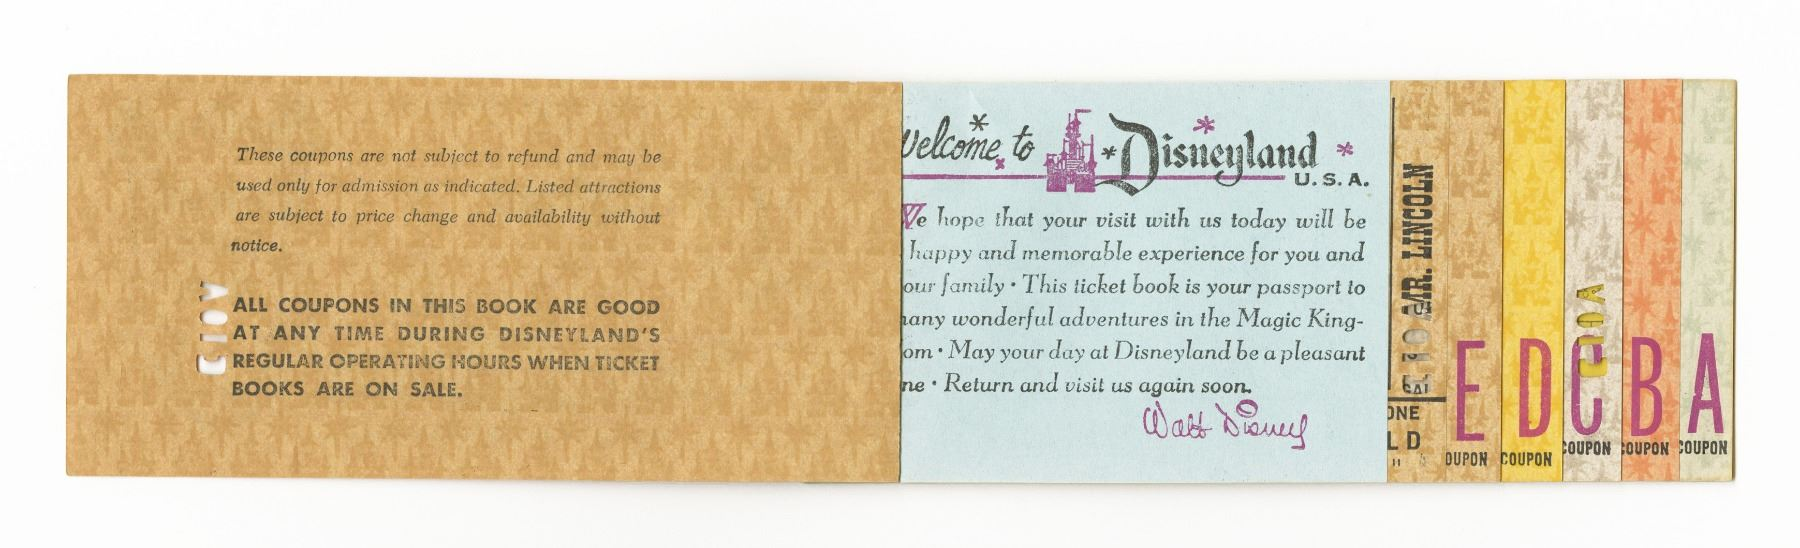 "Disneyland Child's ""Special Guest"" Ticket Book."